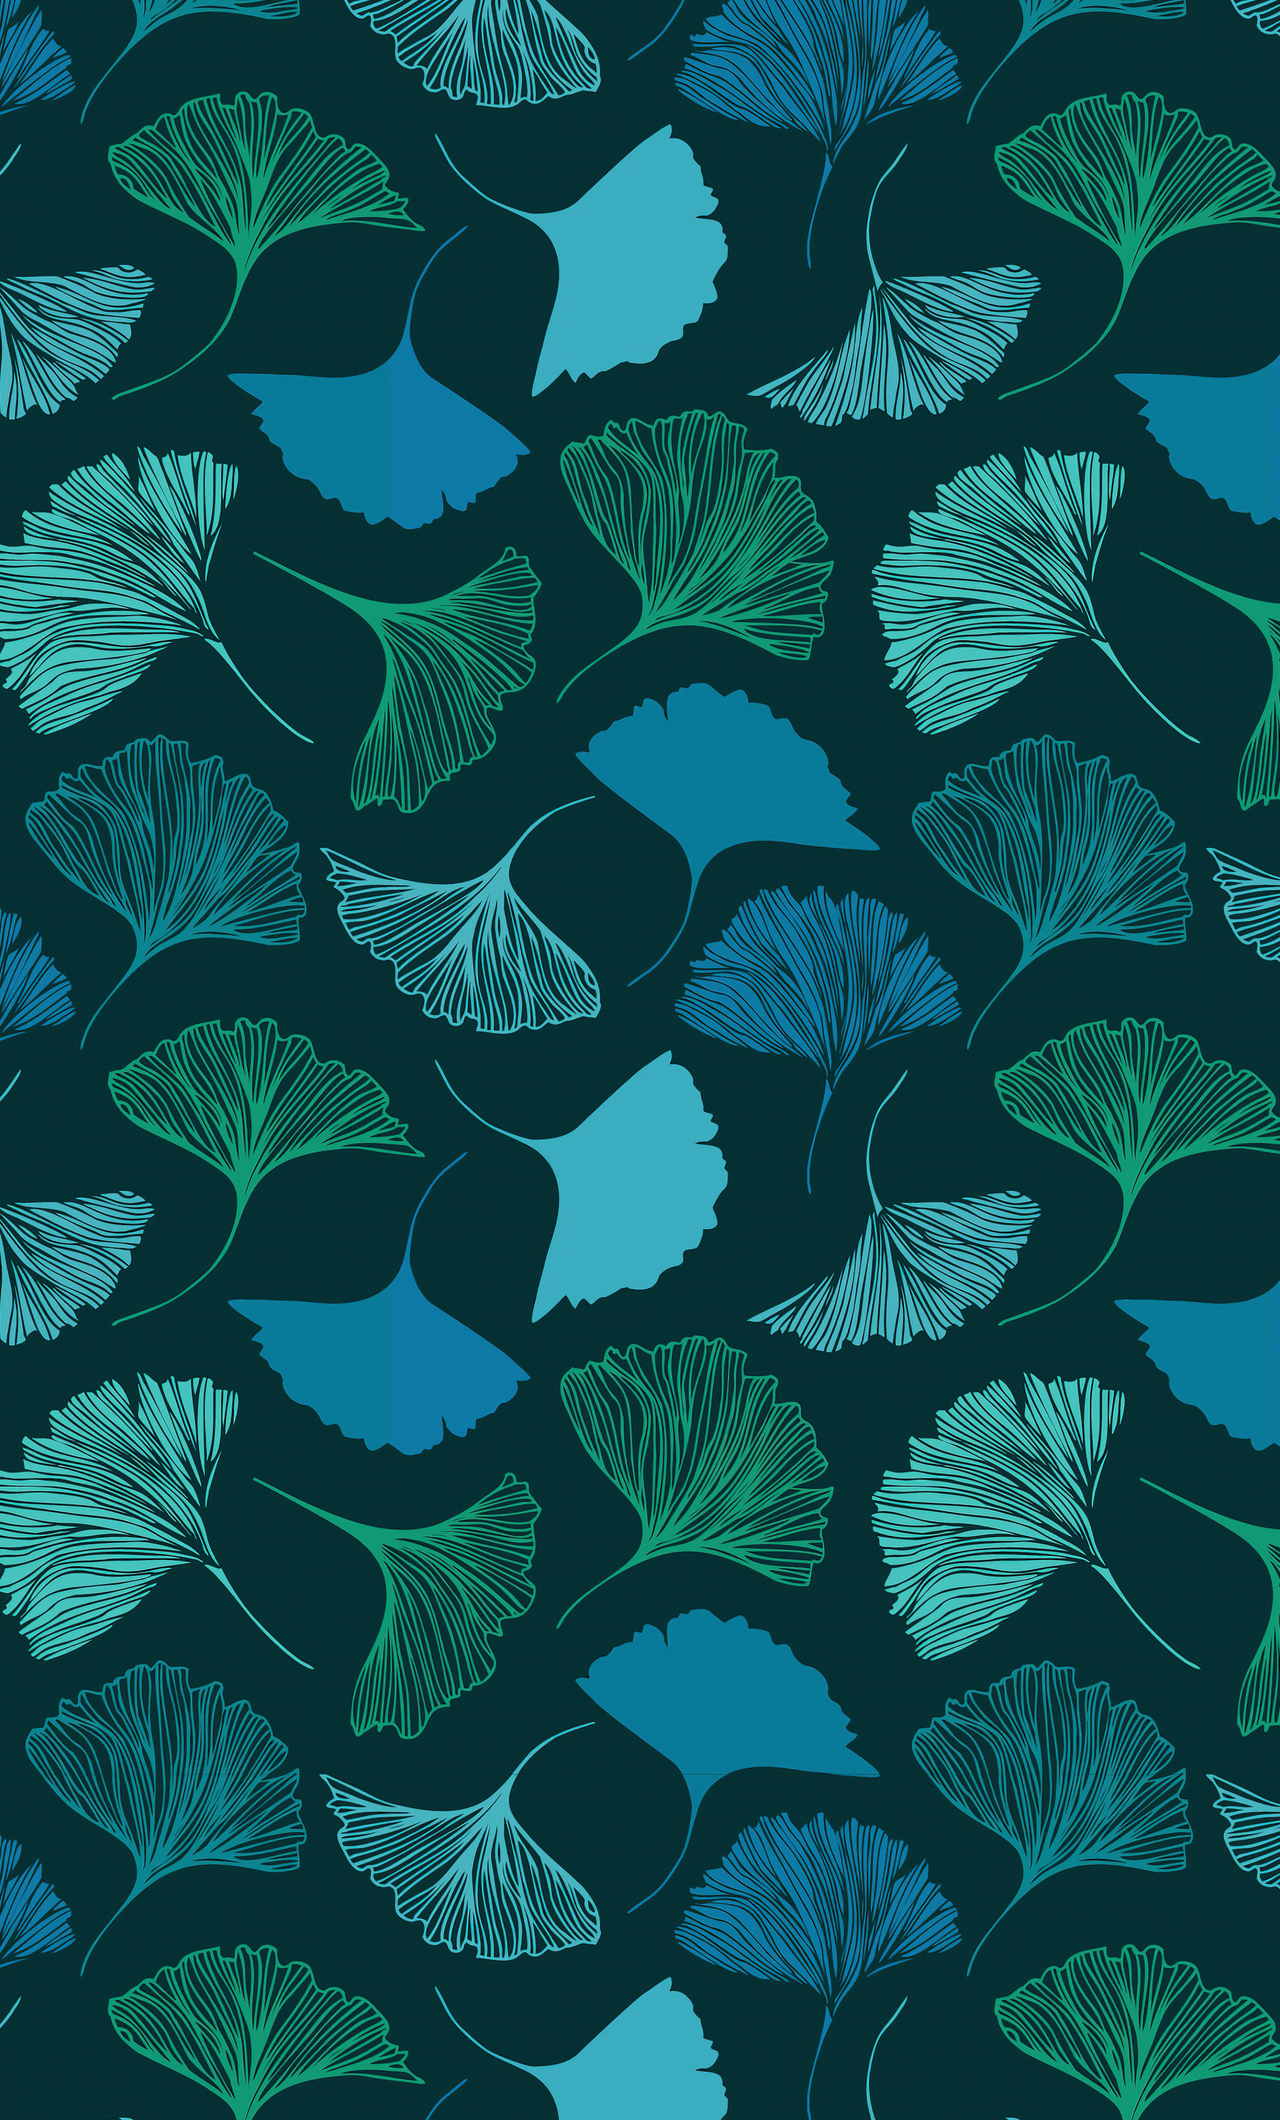 pattern-plants-abstract-4k-23.jpg